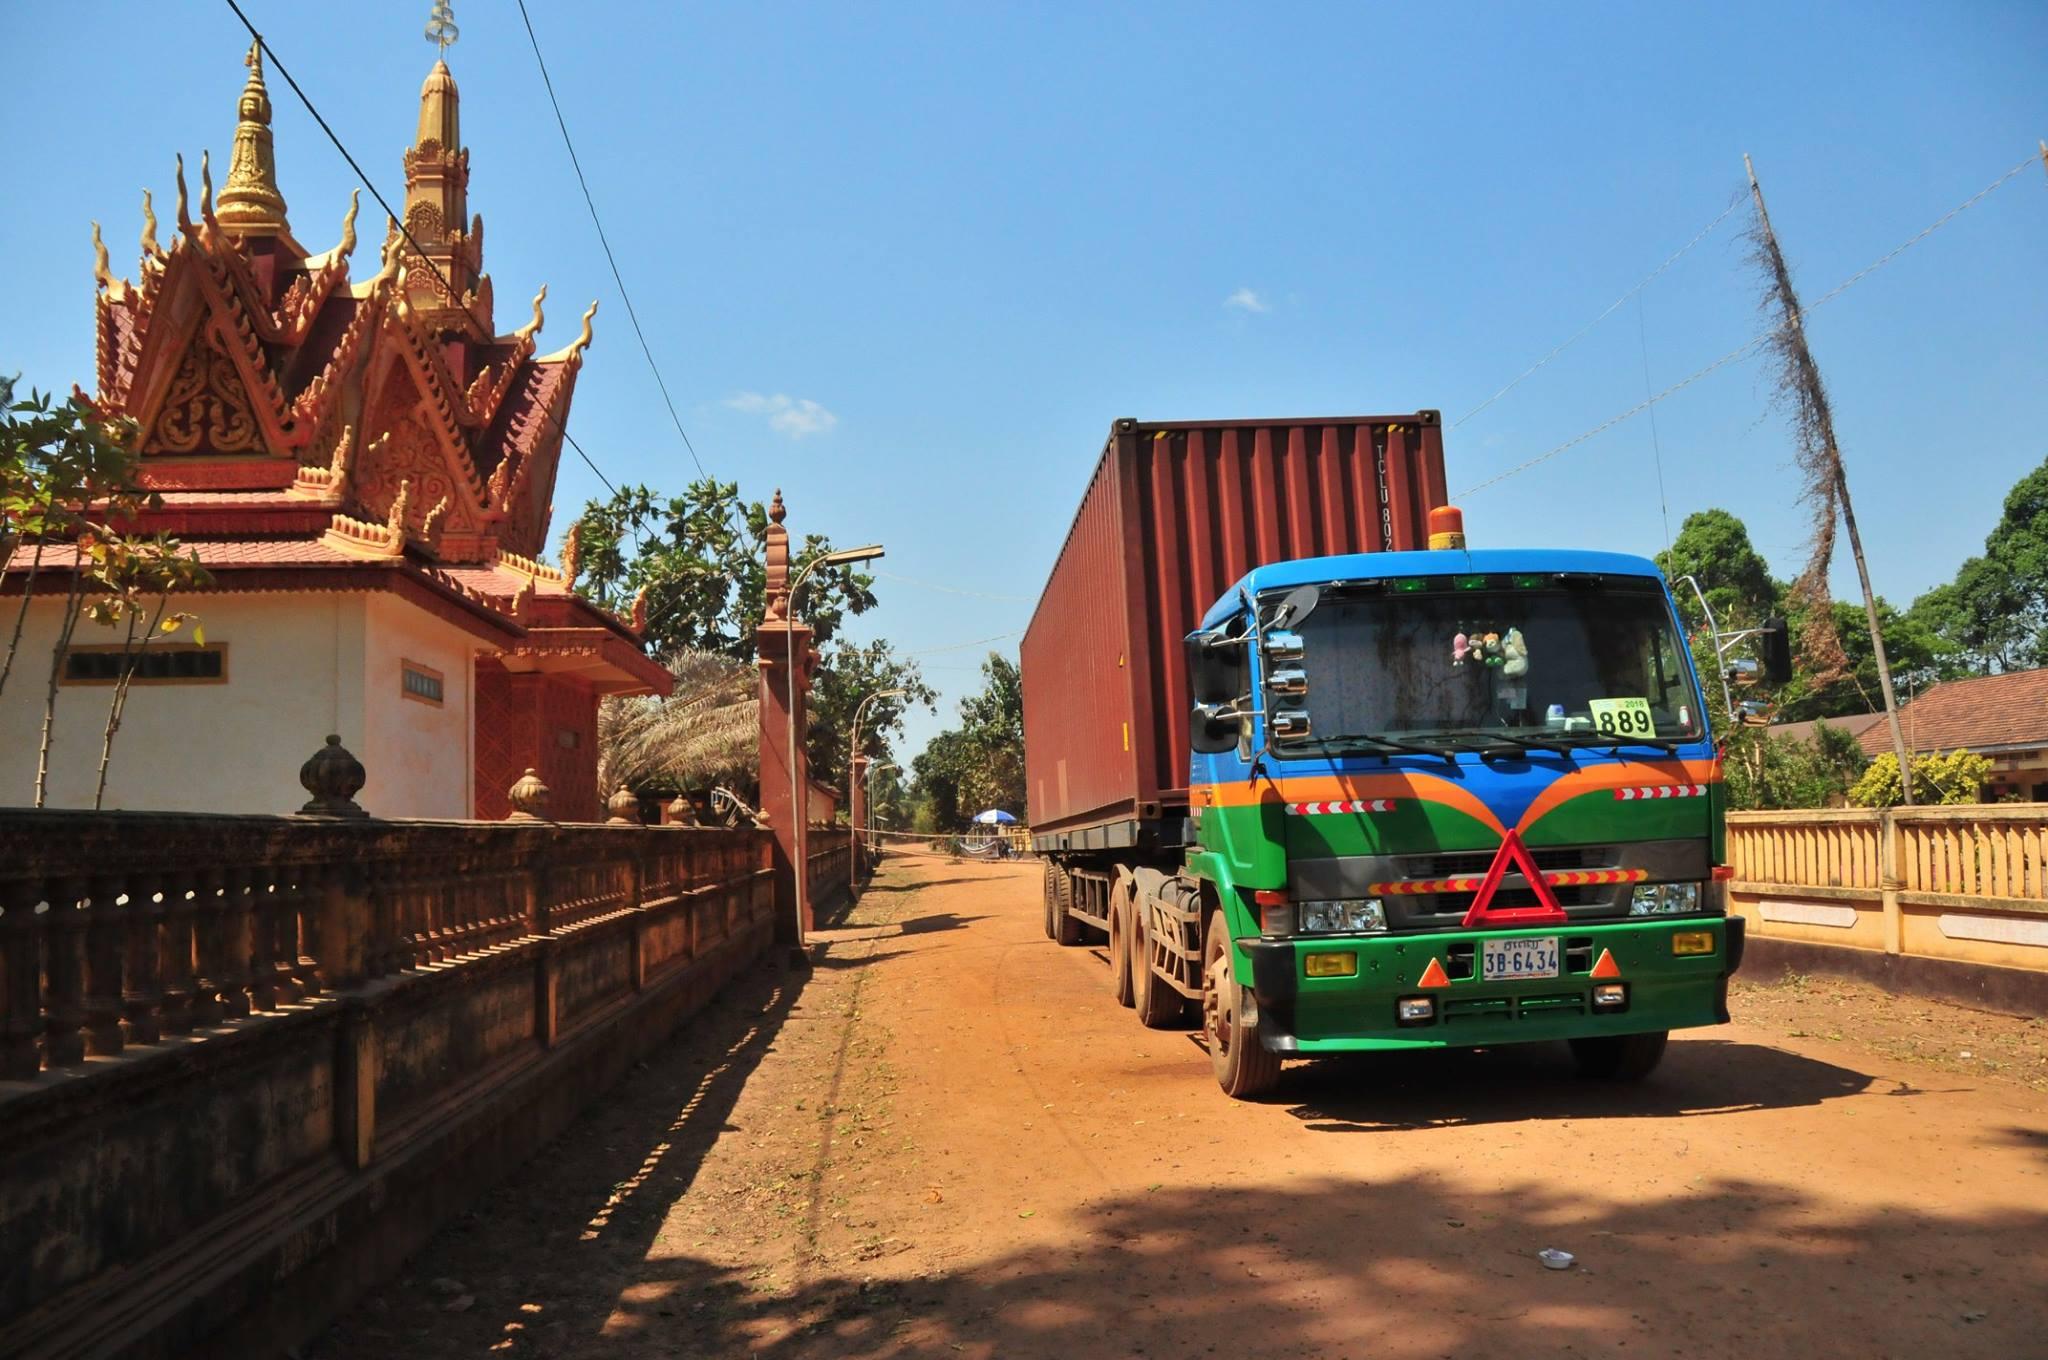 https://0901.nccdn.net/4_2/000/000/056/7dc/cambodia-10.jpg